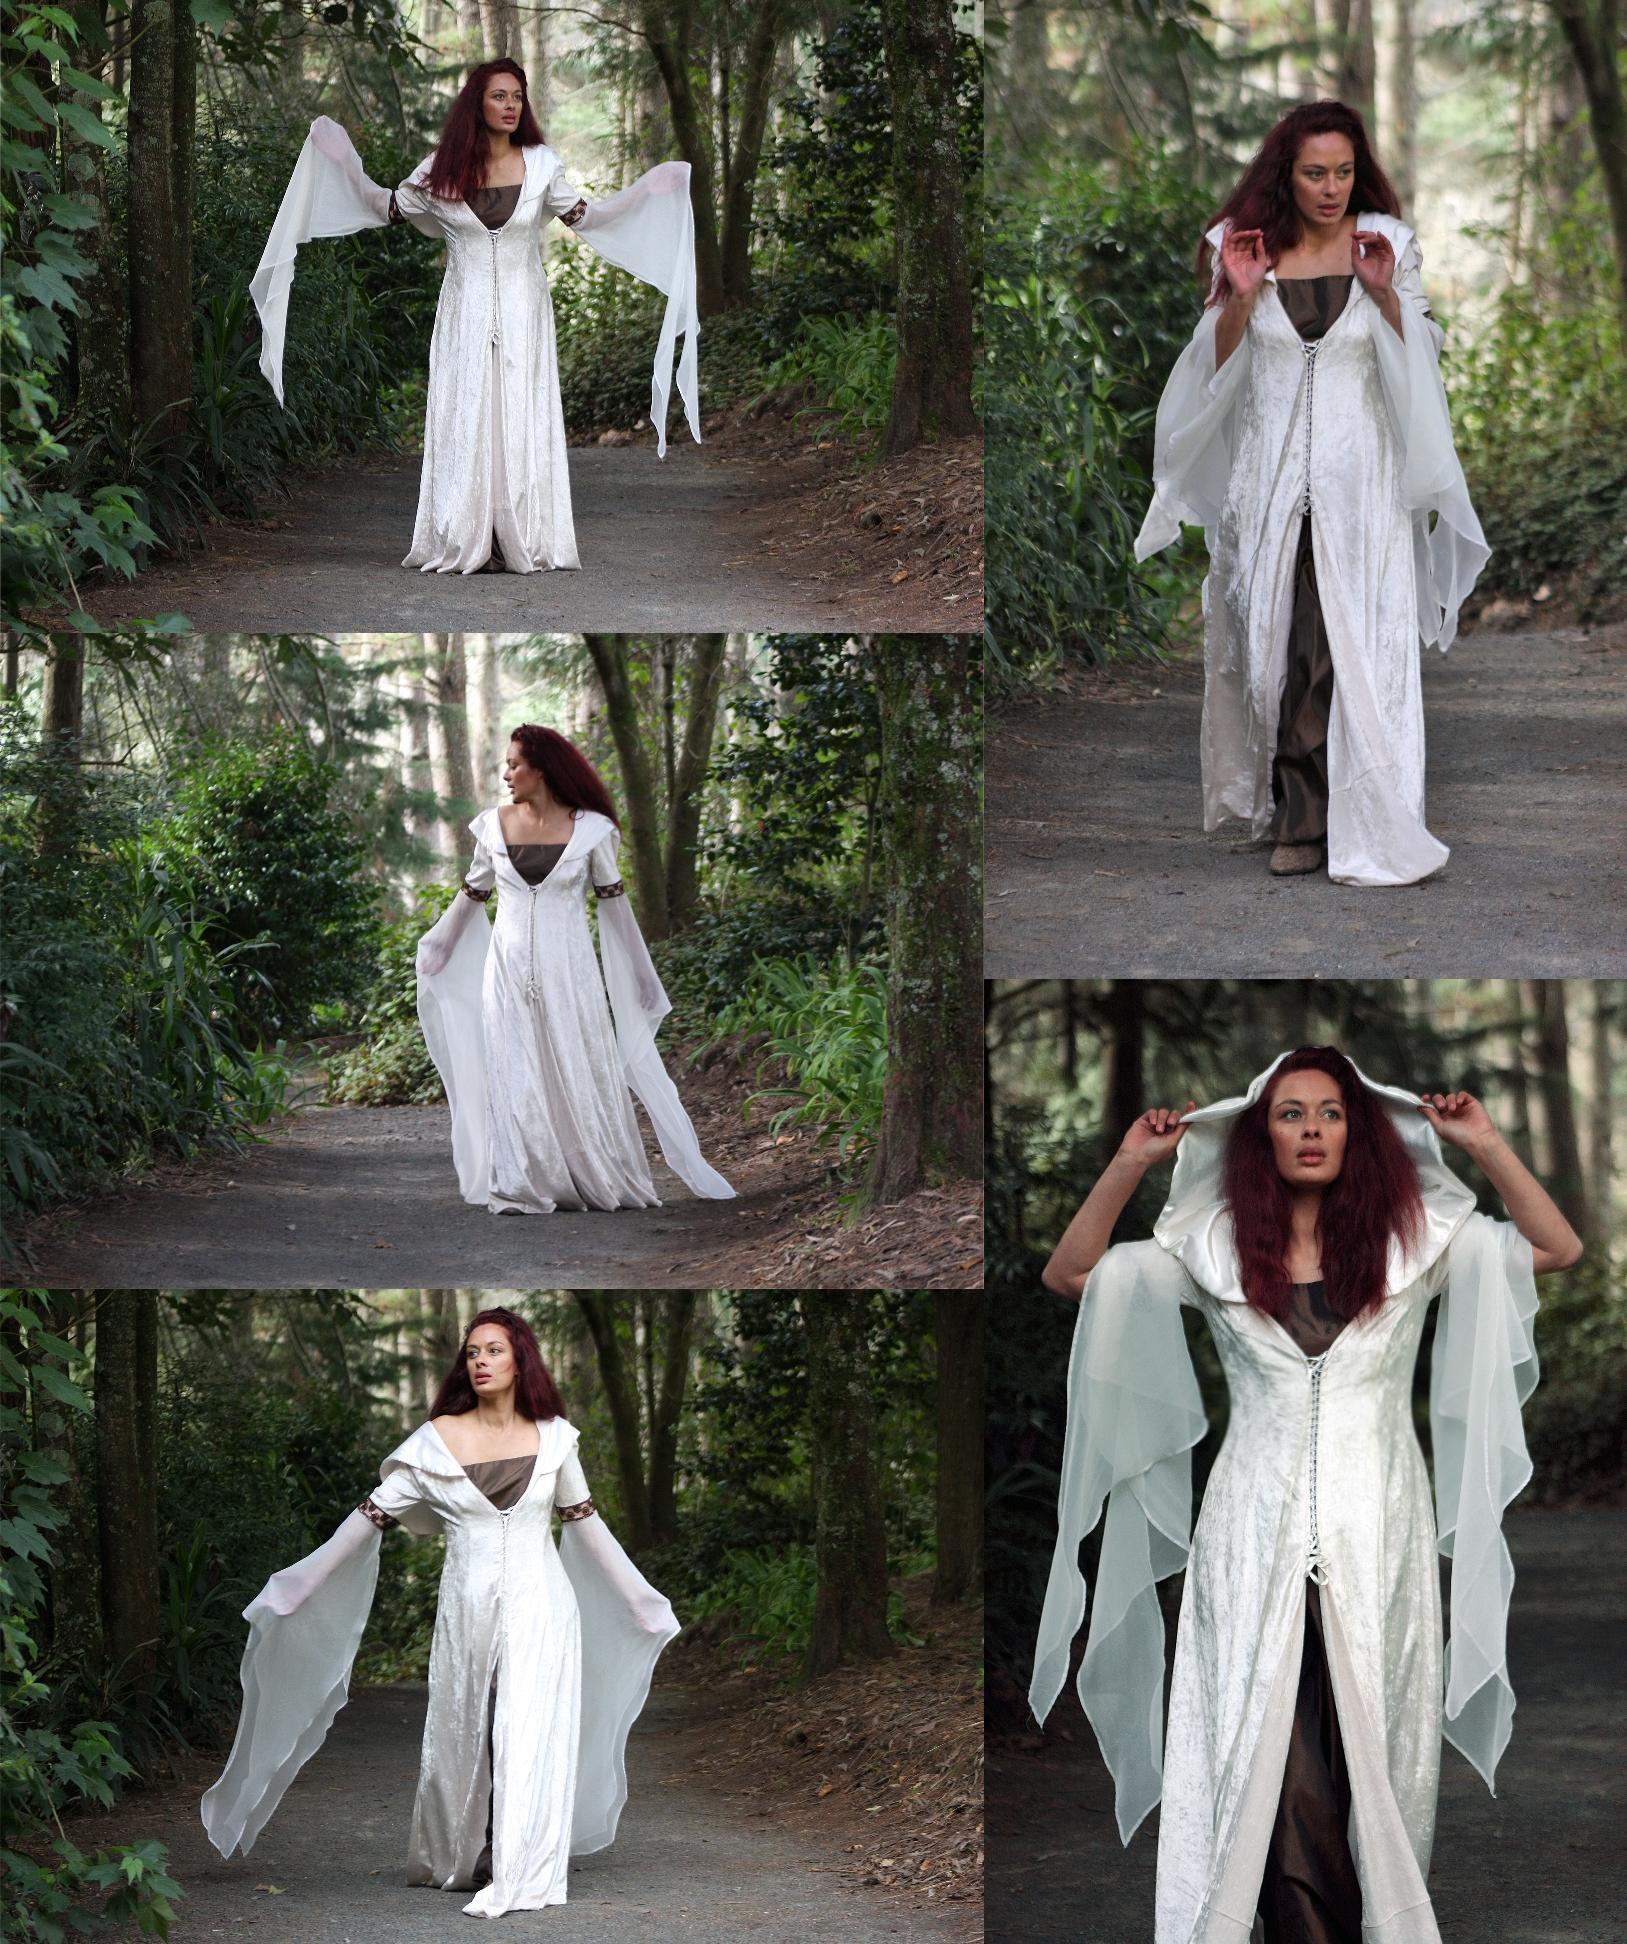 White Witch set by CathleenTarawhiti